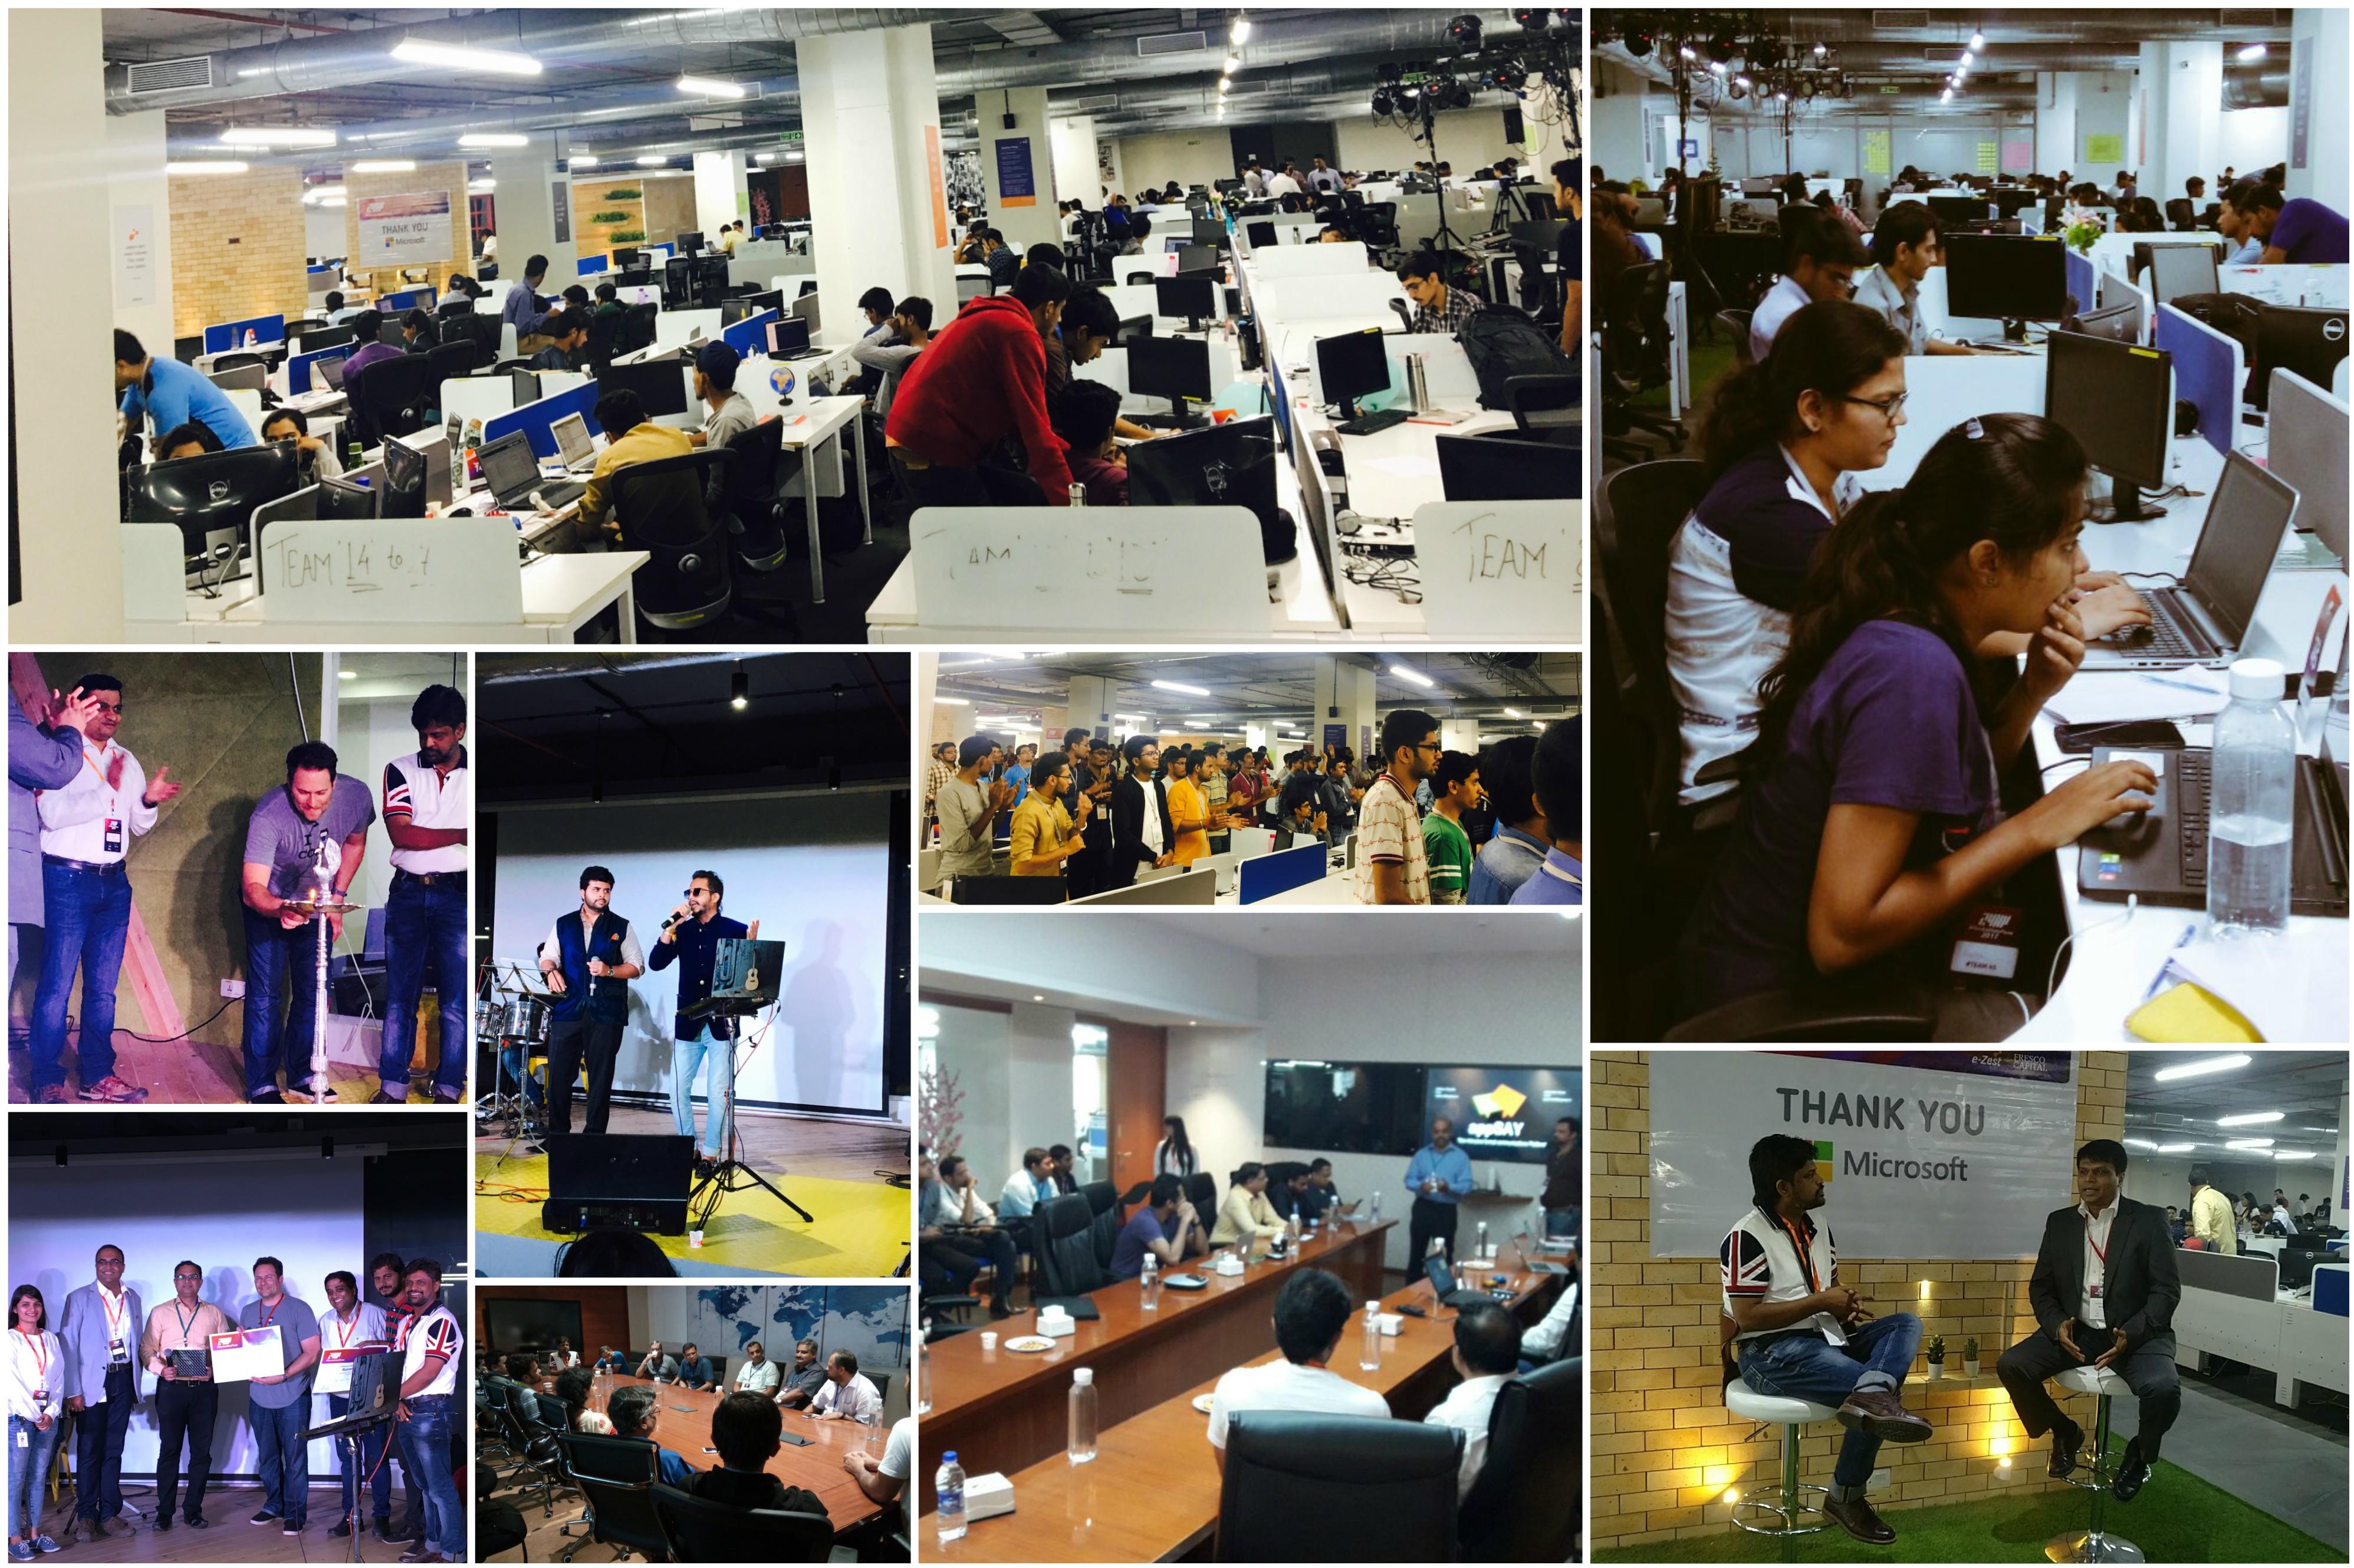 #HackathonPune Day 1: The Beginning